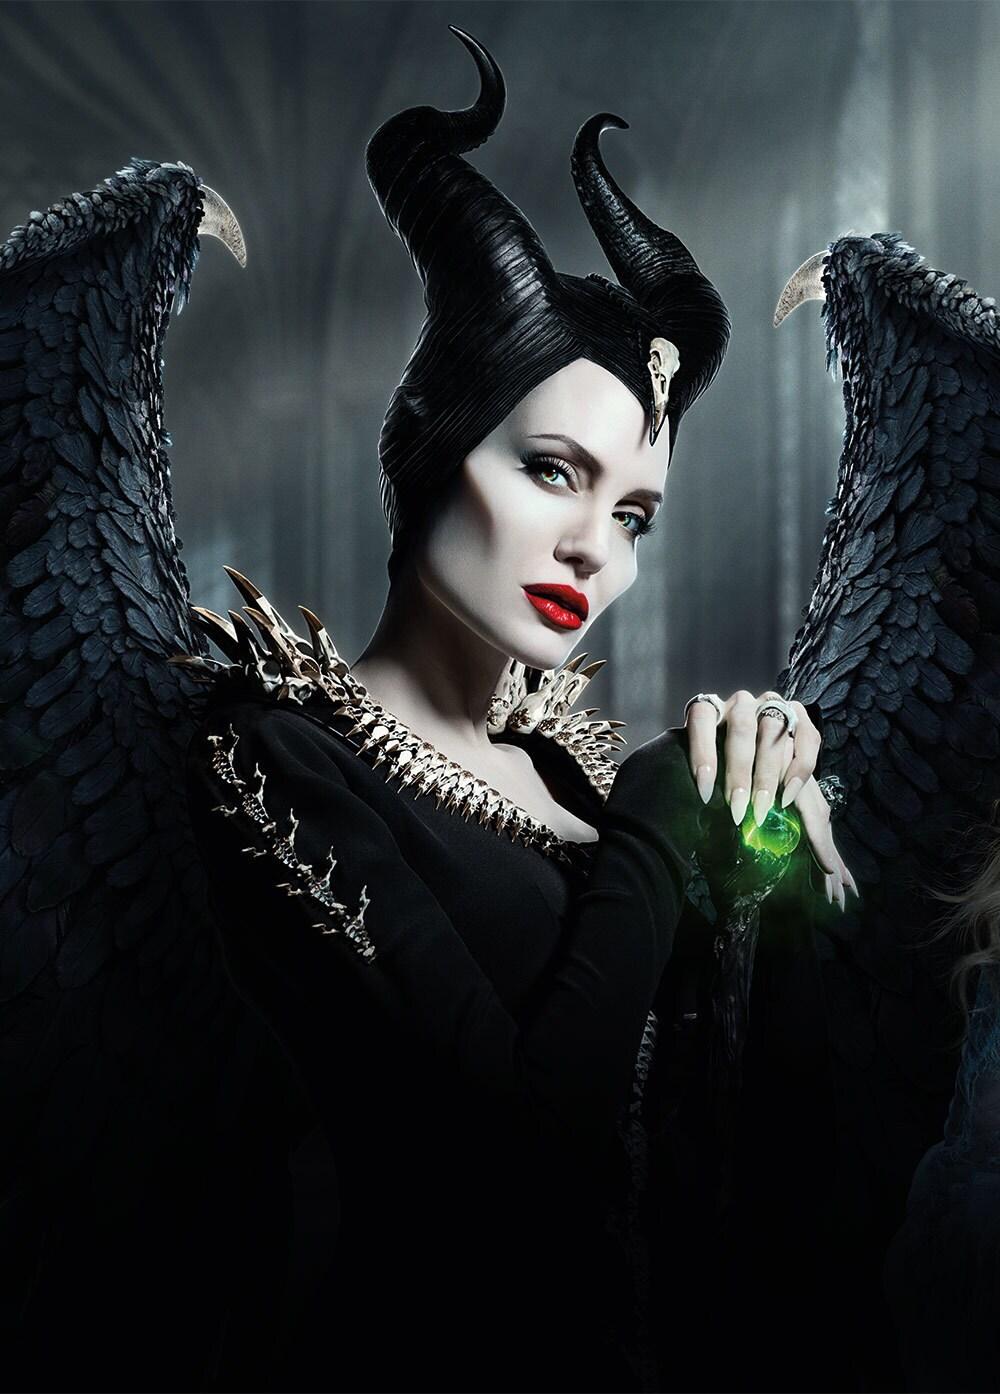 Maleficent-Maleficent